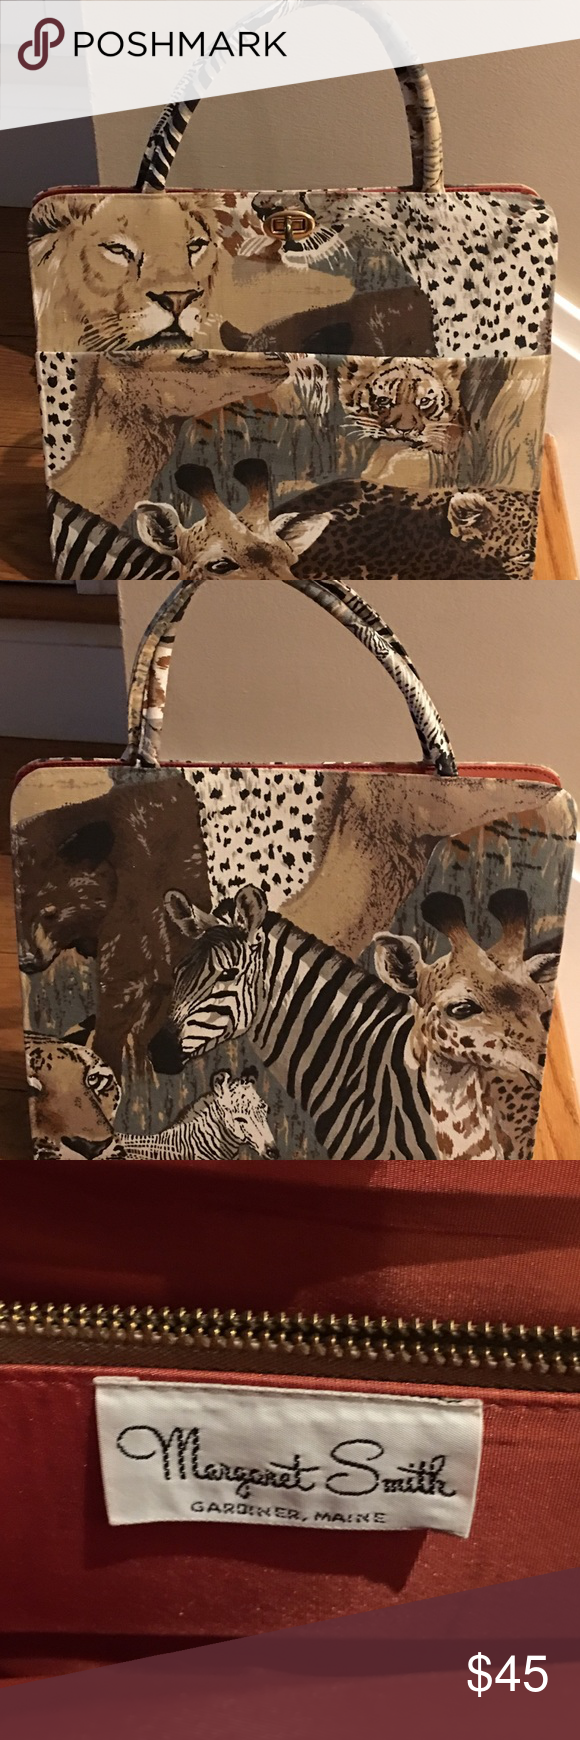 1c711a4a9994 Vintage Margaret Smith Animal Print Tote Handbag Margaret Smith vintage  cotton canvas purse. Amazing condition. Silk lining. Front pocket.